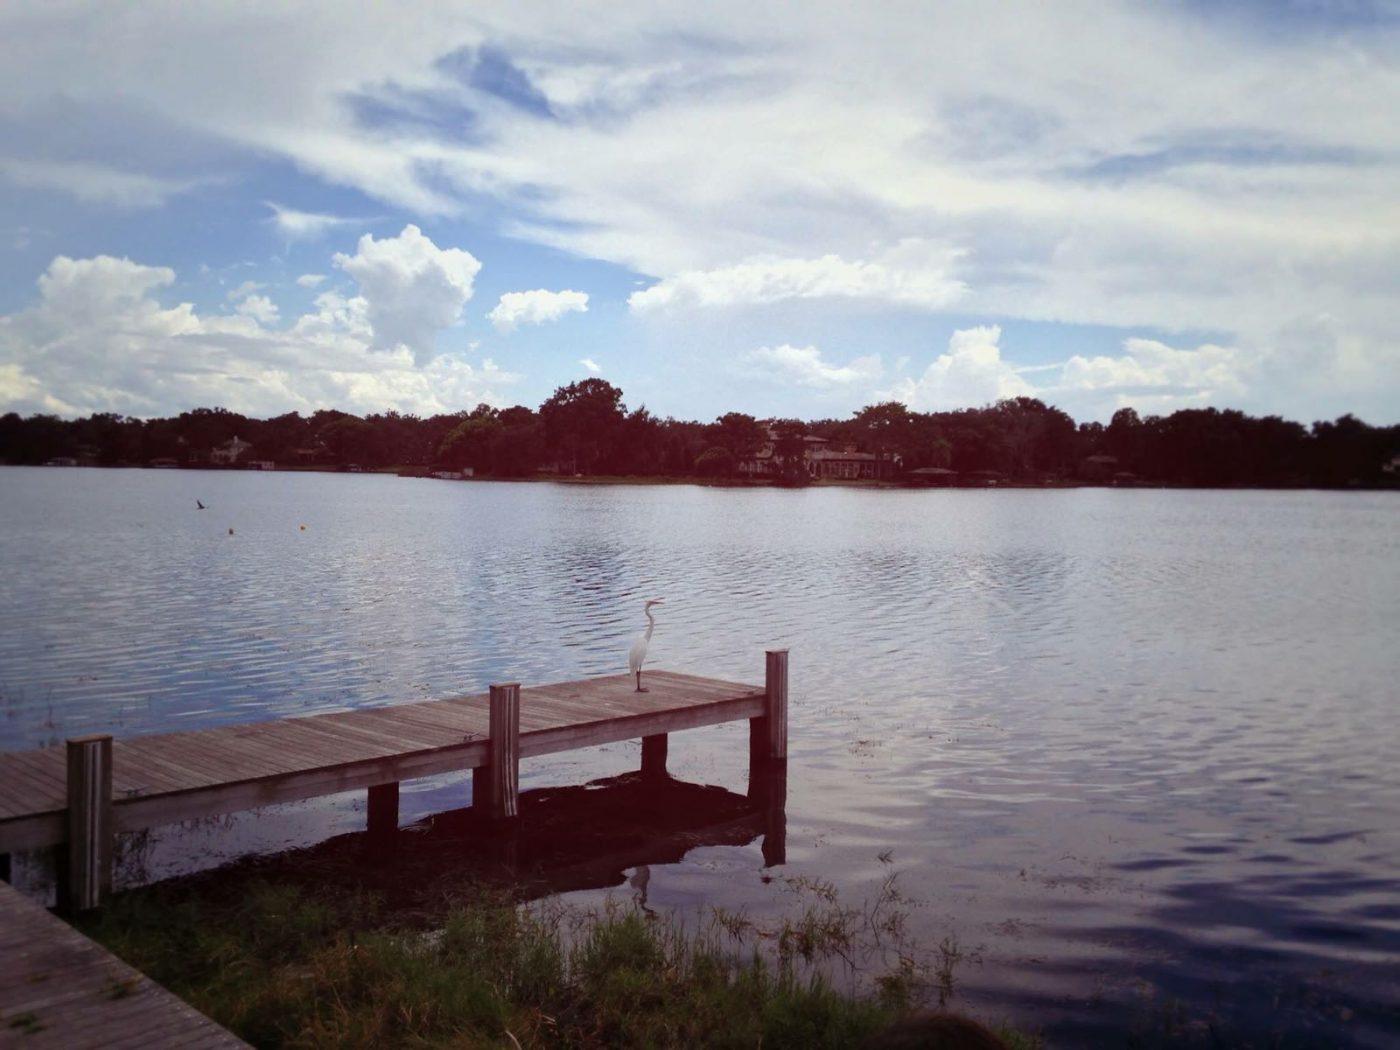 Winter Park, Florida 2